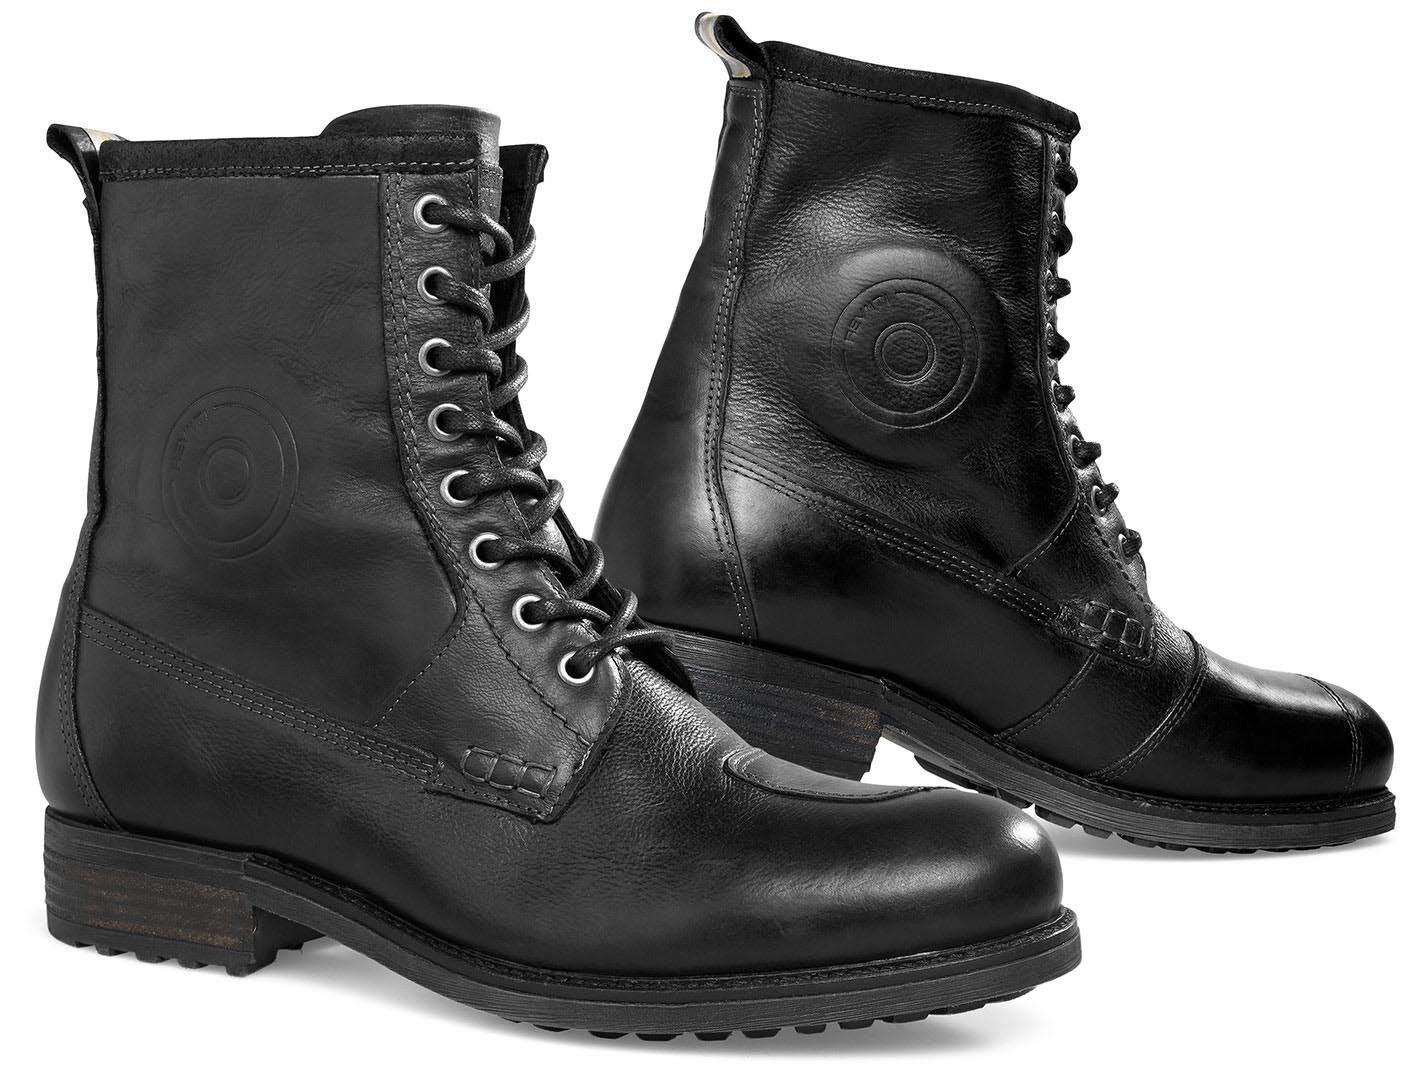 Revit Rodeo Boots Black 41